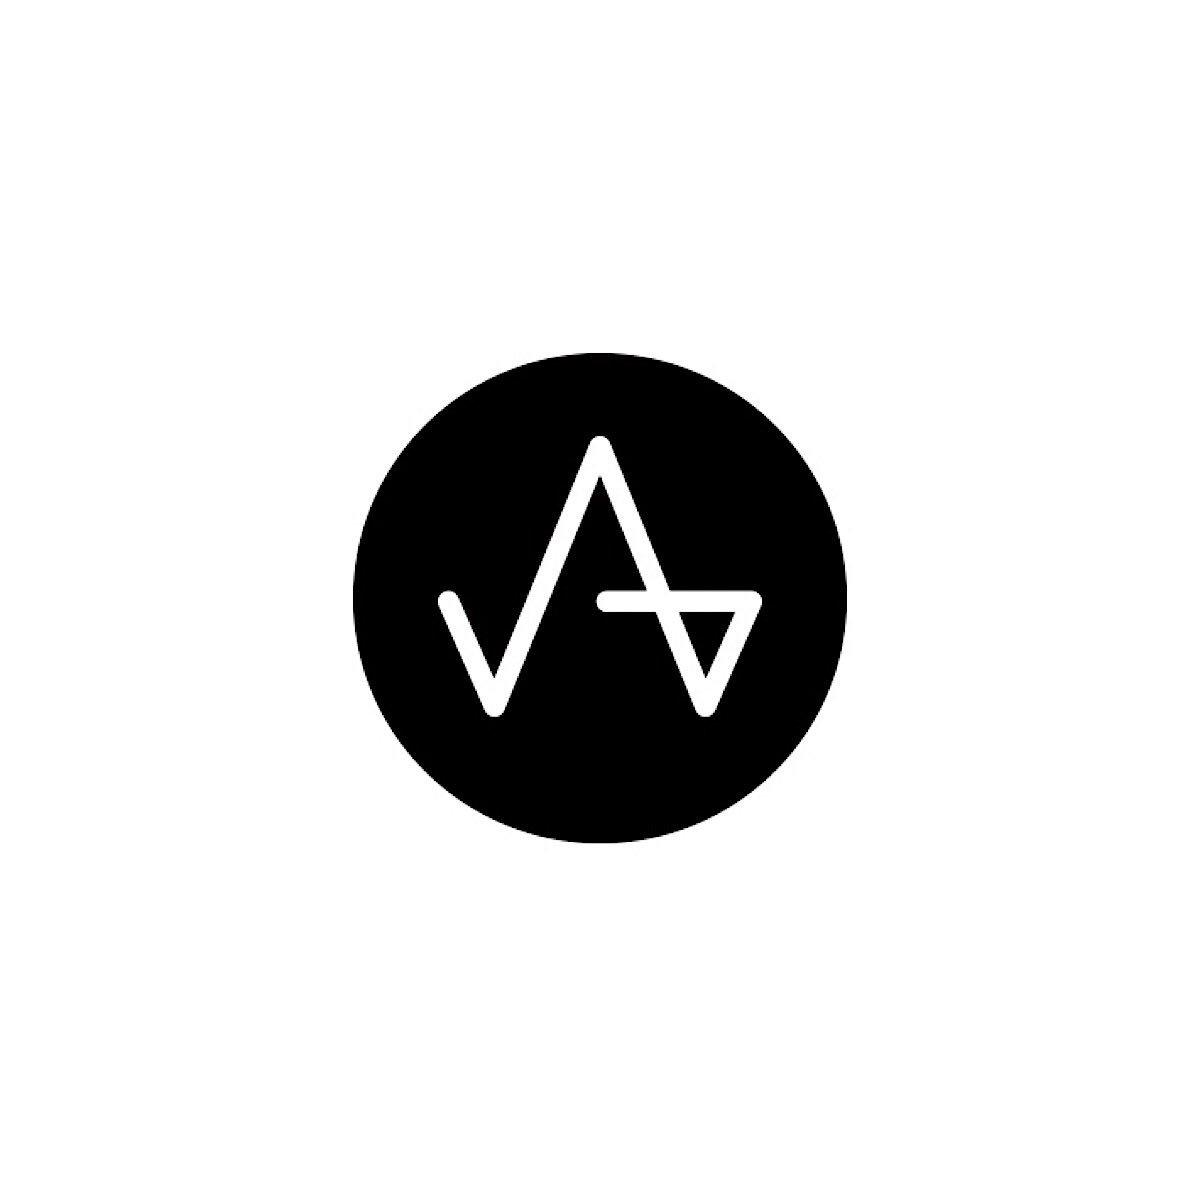 The logo smith logo brand id designer on twitter wavepulse logoportfolio symbol minimal typography type initials design graphicdesign httpsinstagrampbcjwnlmjb5p picitterpjepmweh88 buycottarizona Choice Image